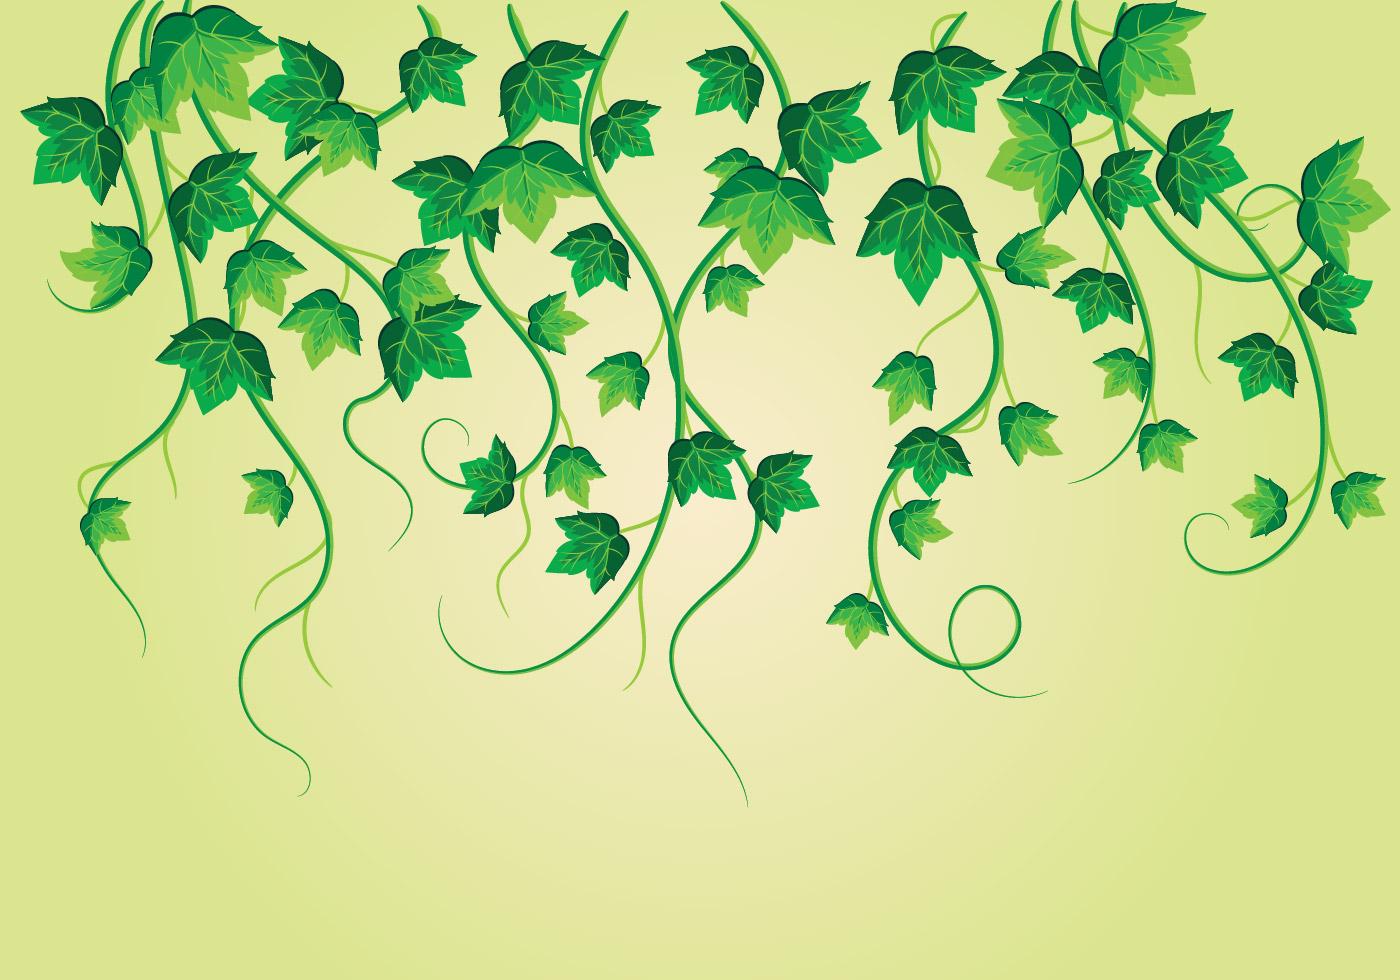 Climbing Plant Free Vector Art - (7816 Free Downloads)